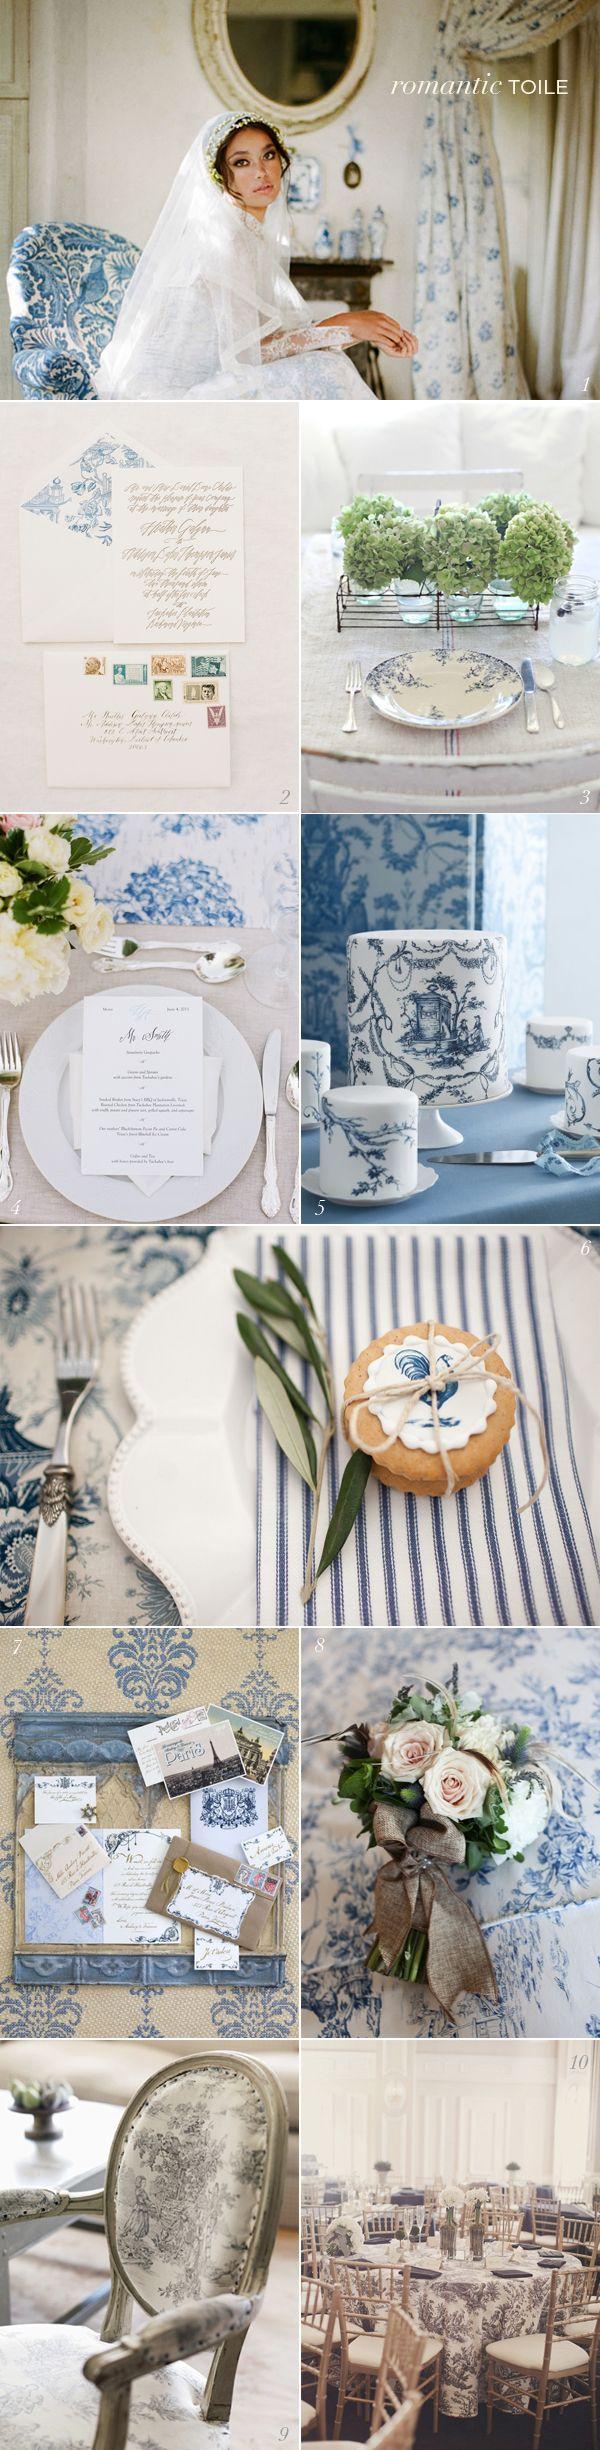 1066 best Weddings: Ideas/Themes images on Pinterest | Bathrooms ...